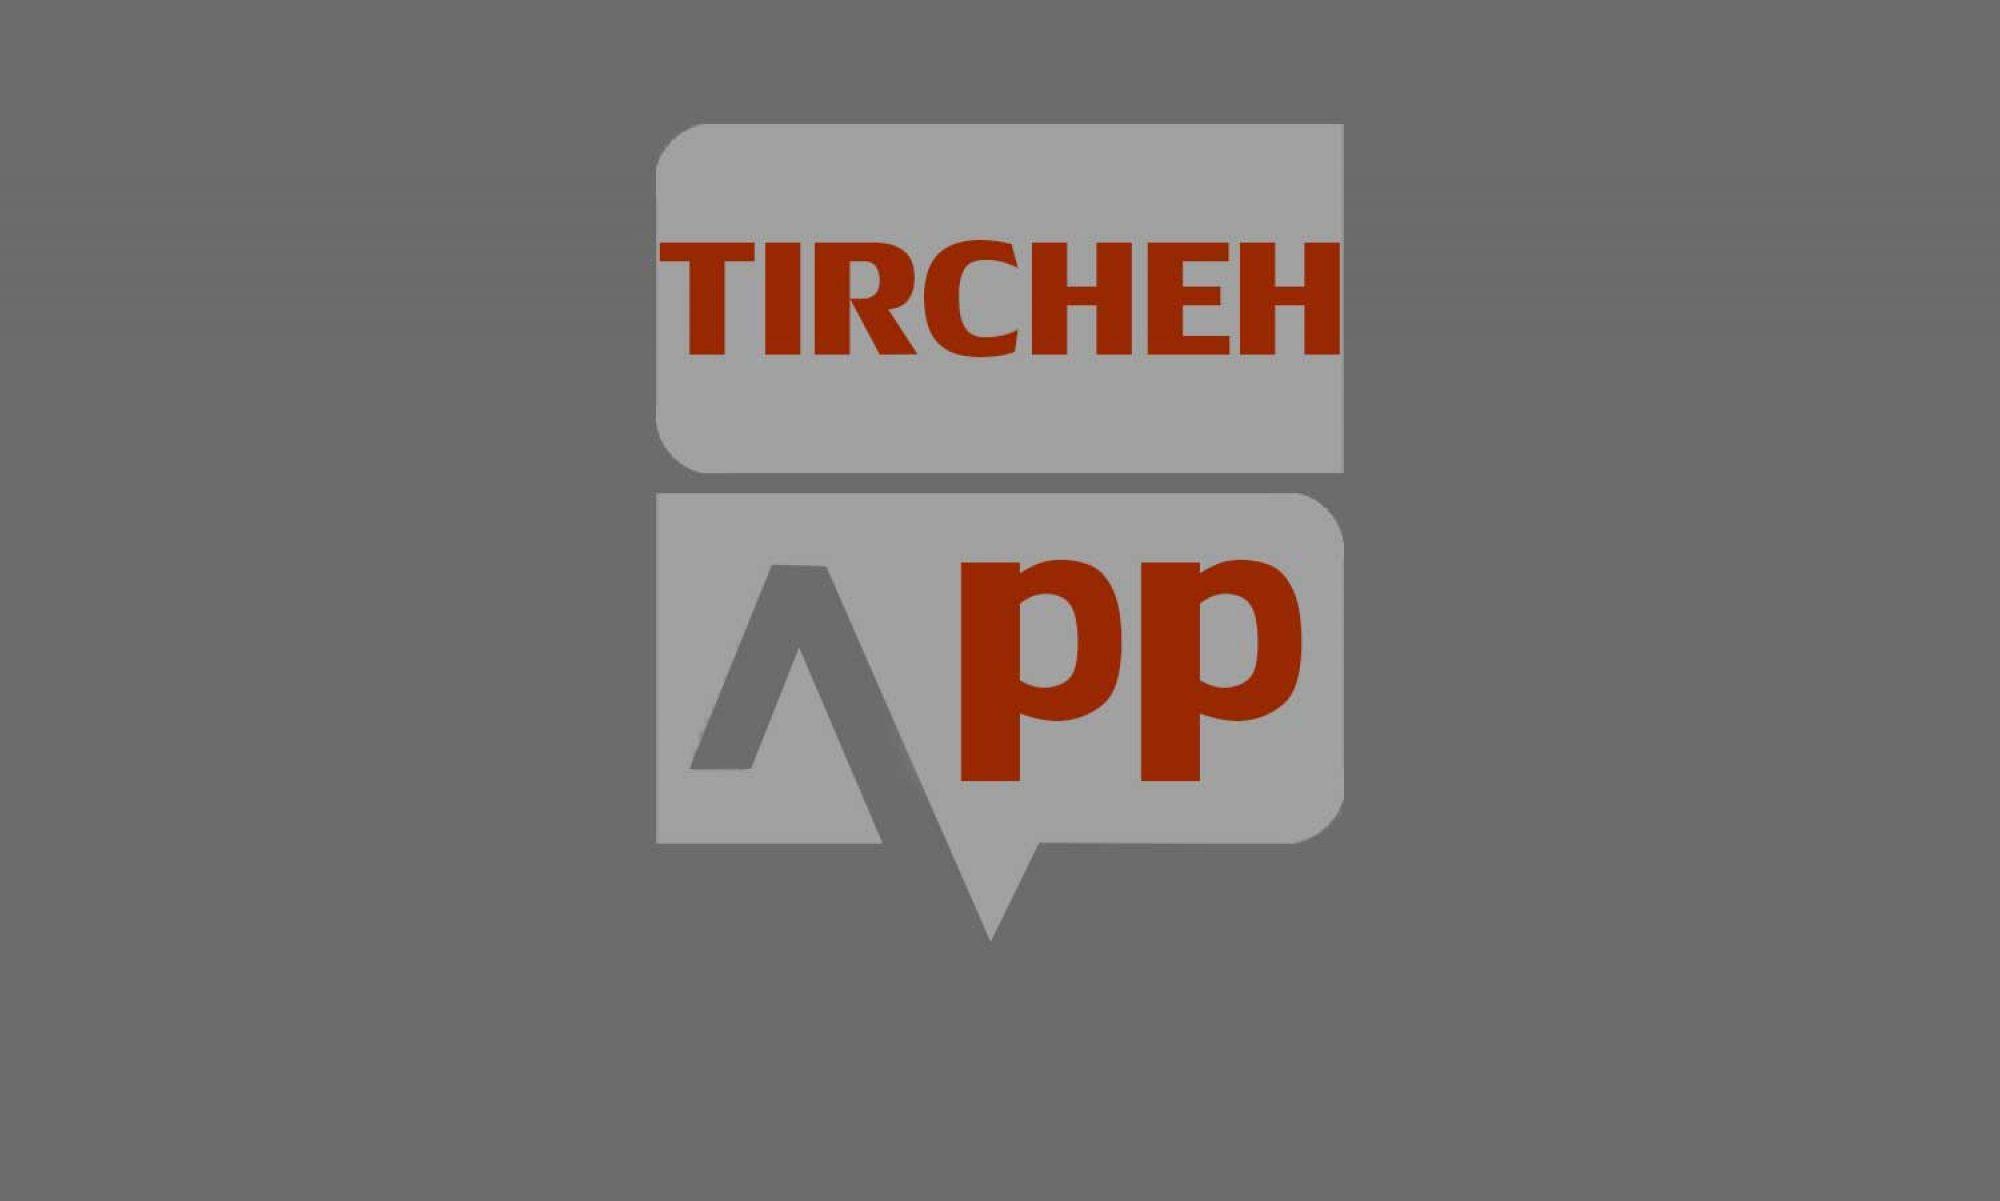 Tricheh App